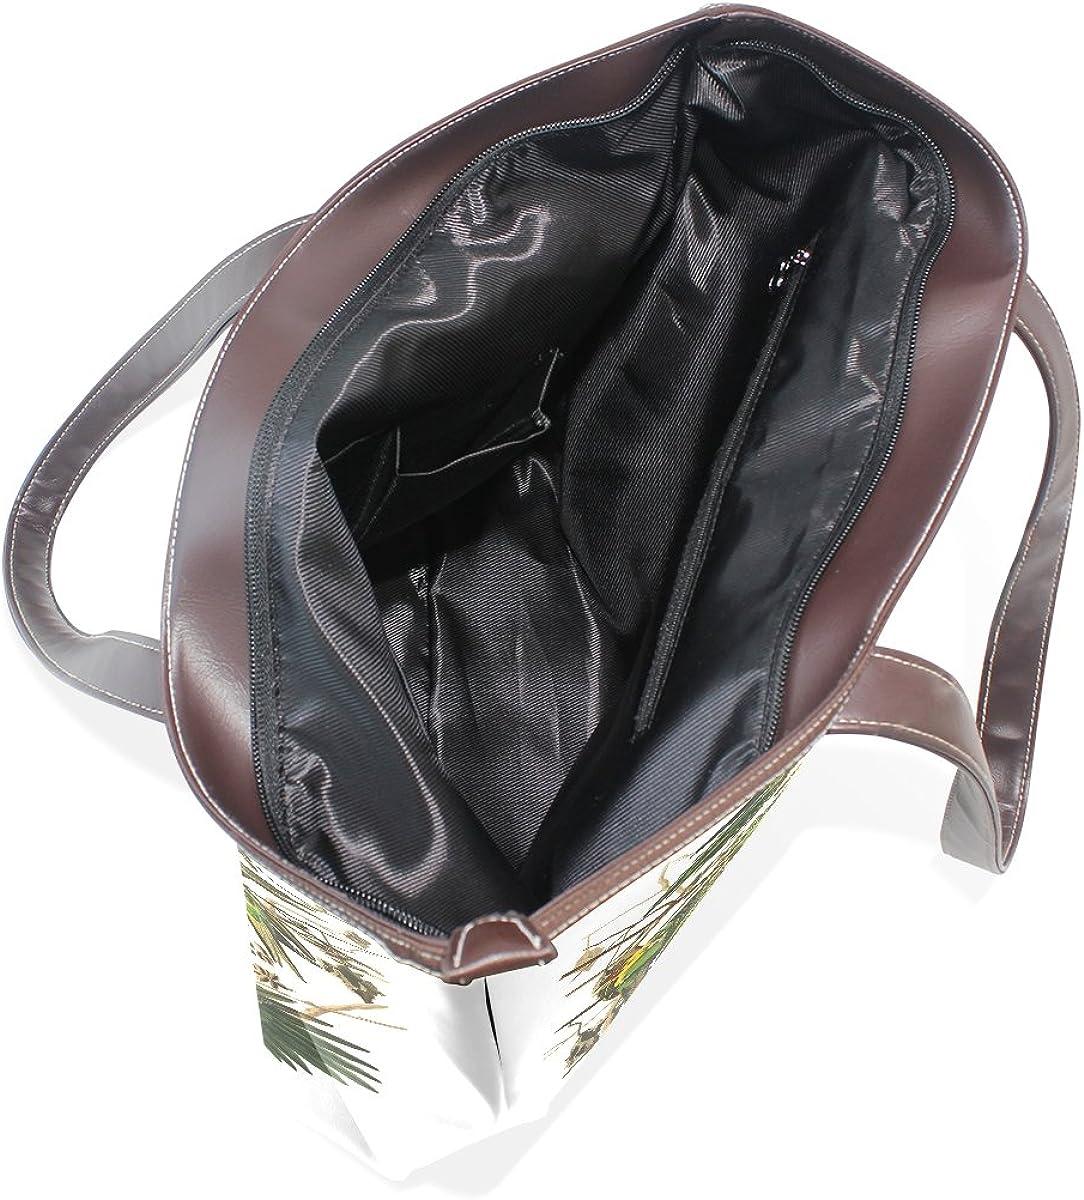 BYouLockX Plate Carolina Parrot Final Pattern Leather Handbags Satchel ShoulderBag for Women